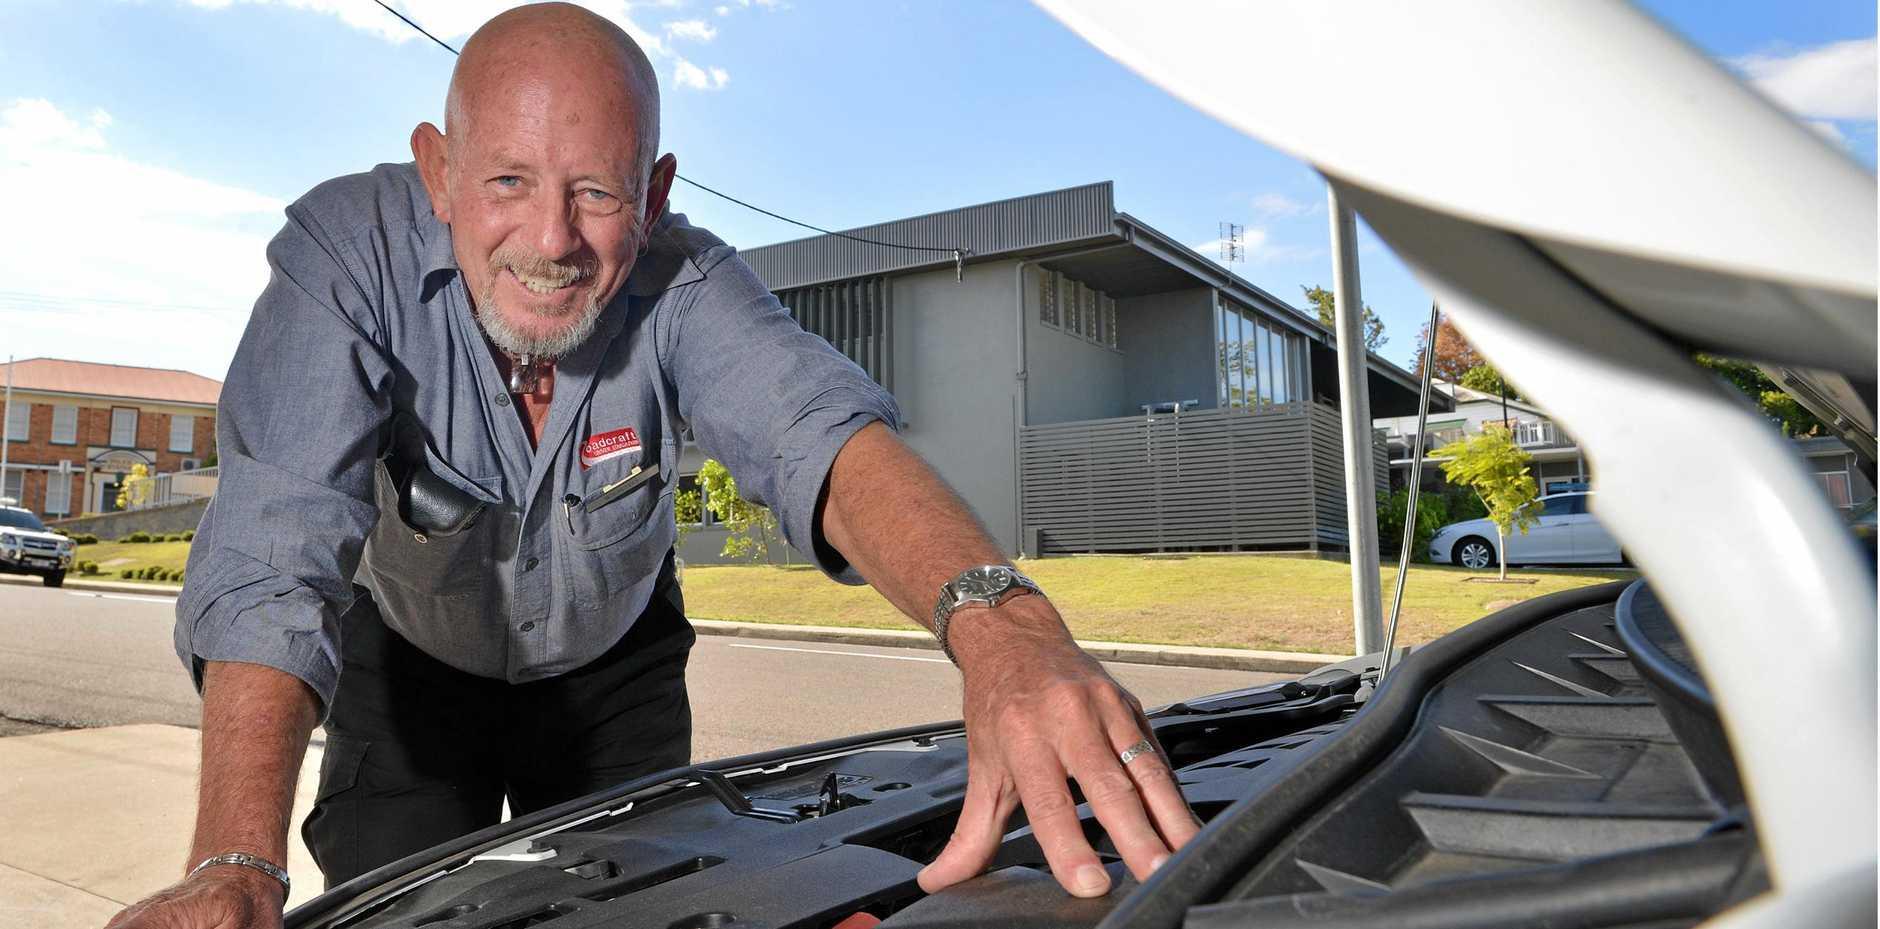 ON BOARD: Roadcraft senior educator Bruce